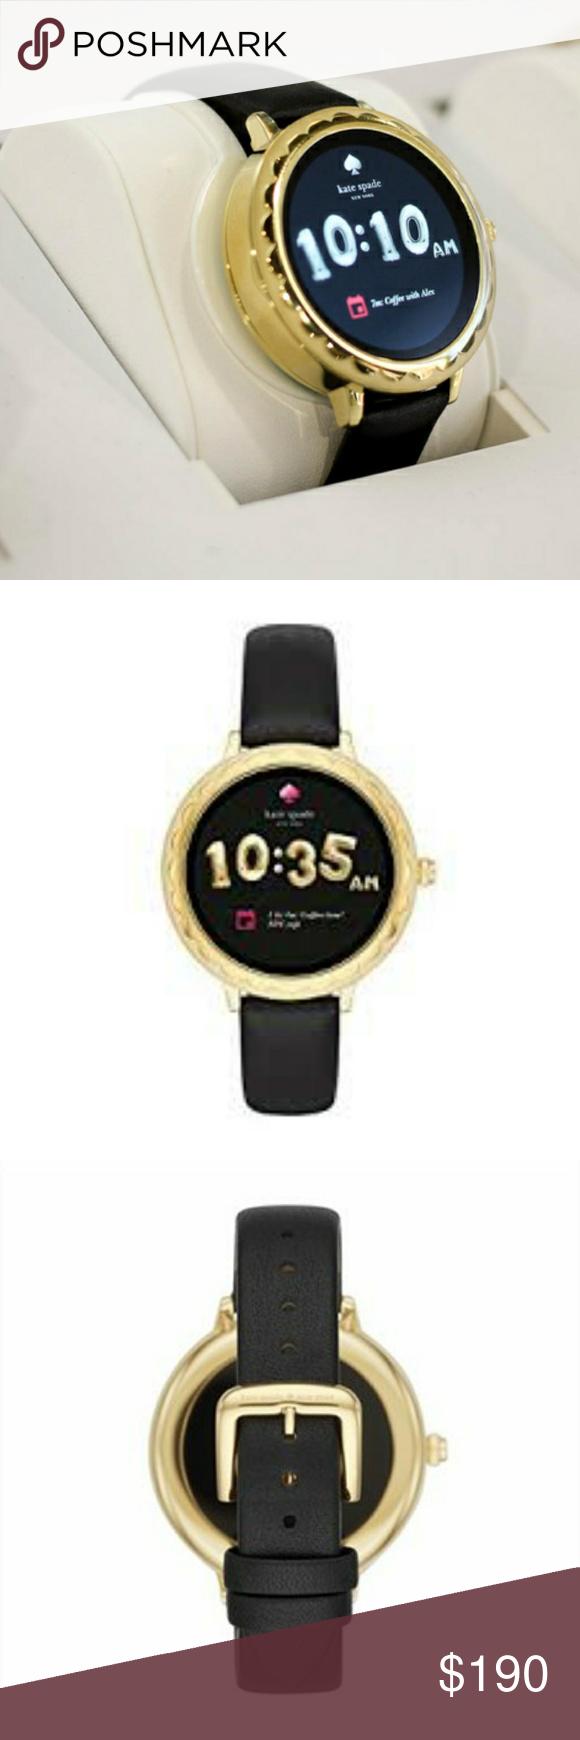 Kate Spade Touchscreen Smartwatch ♠ EUC Style KST2001